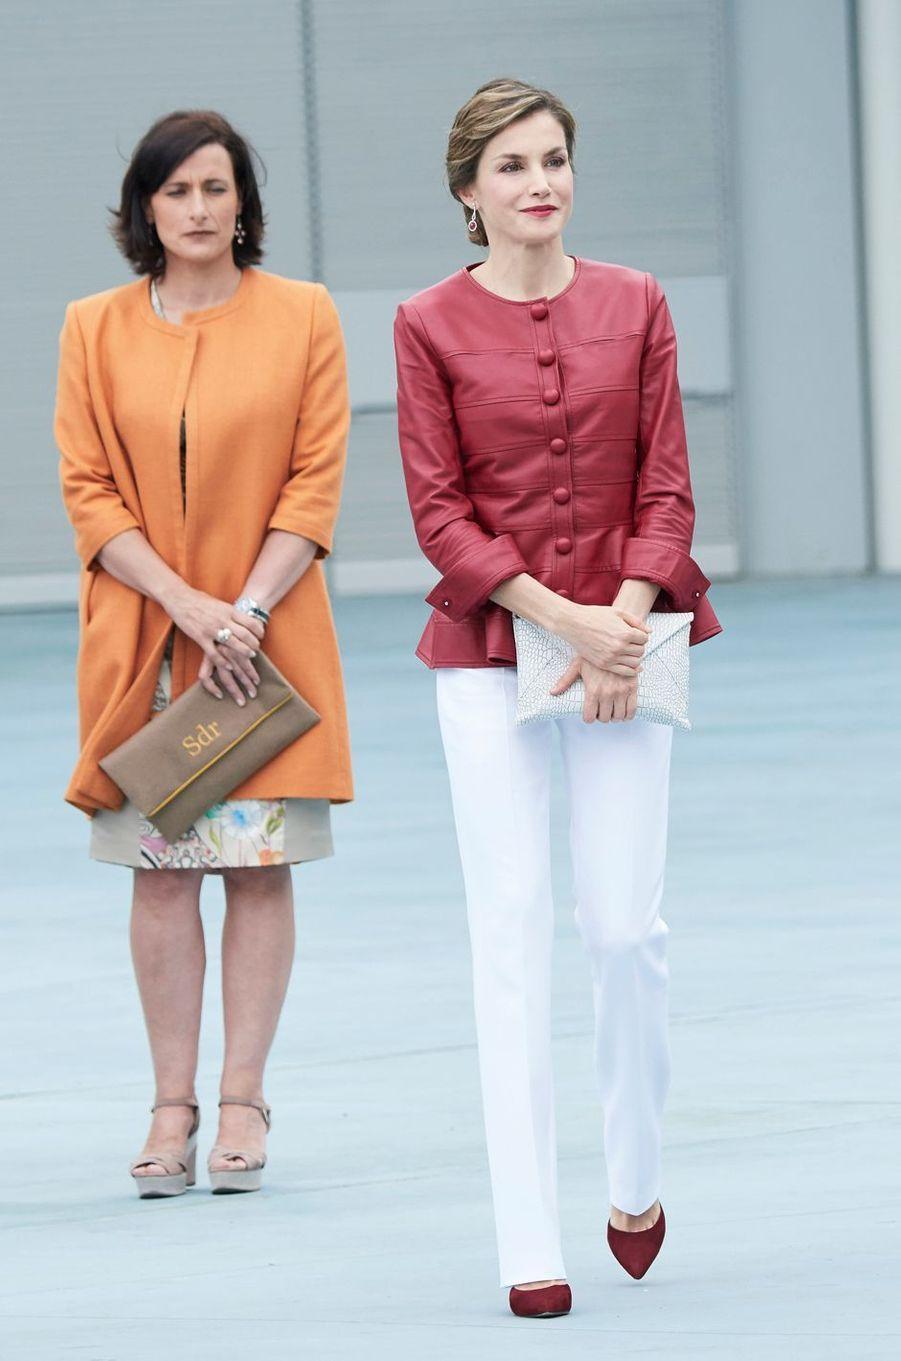 La reine Letizia d'Espagne dans sa veste en cuir Carolina Herrera à Santander, le 23 juin 2017